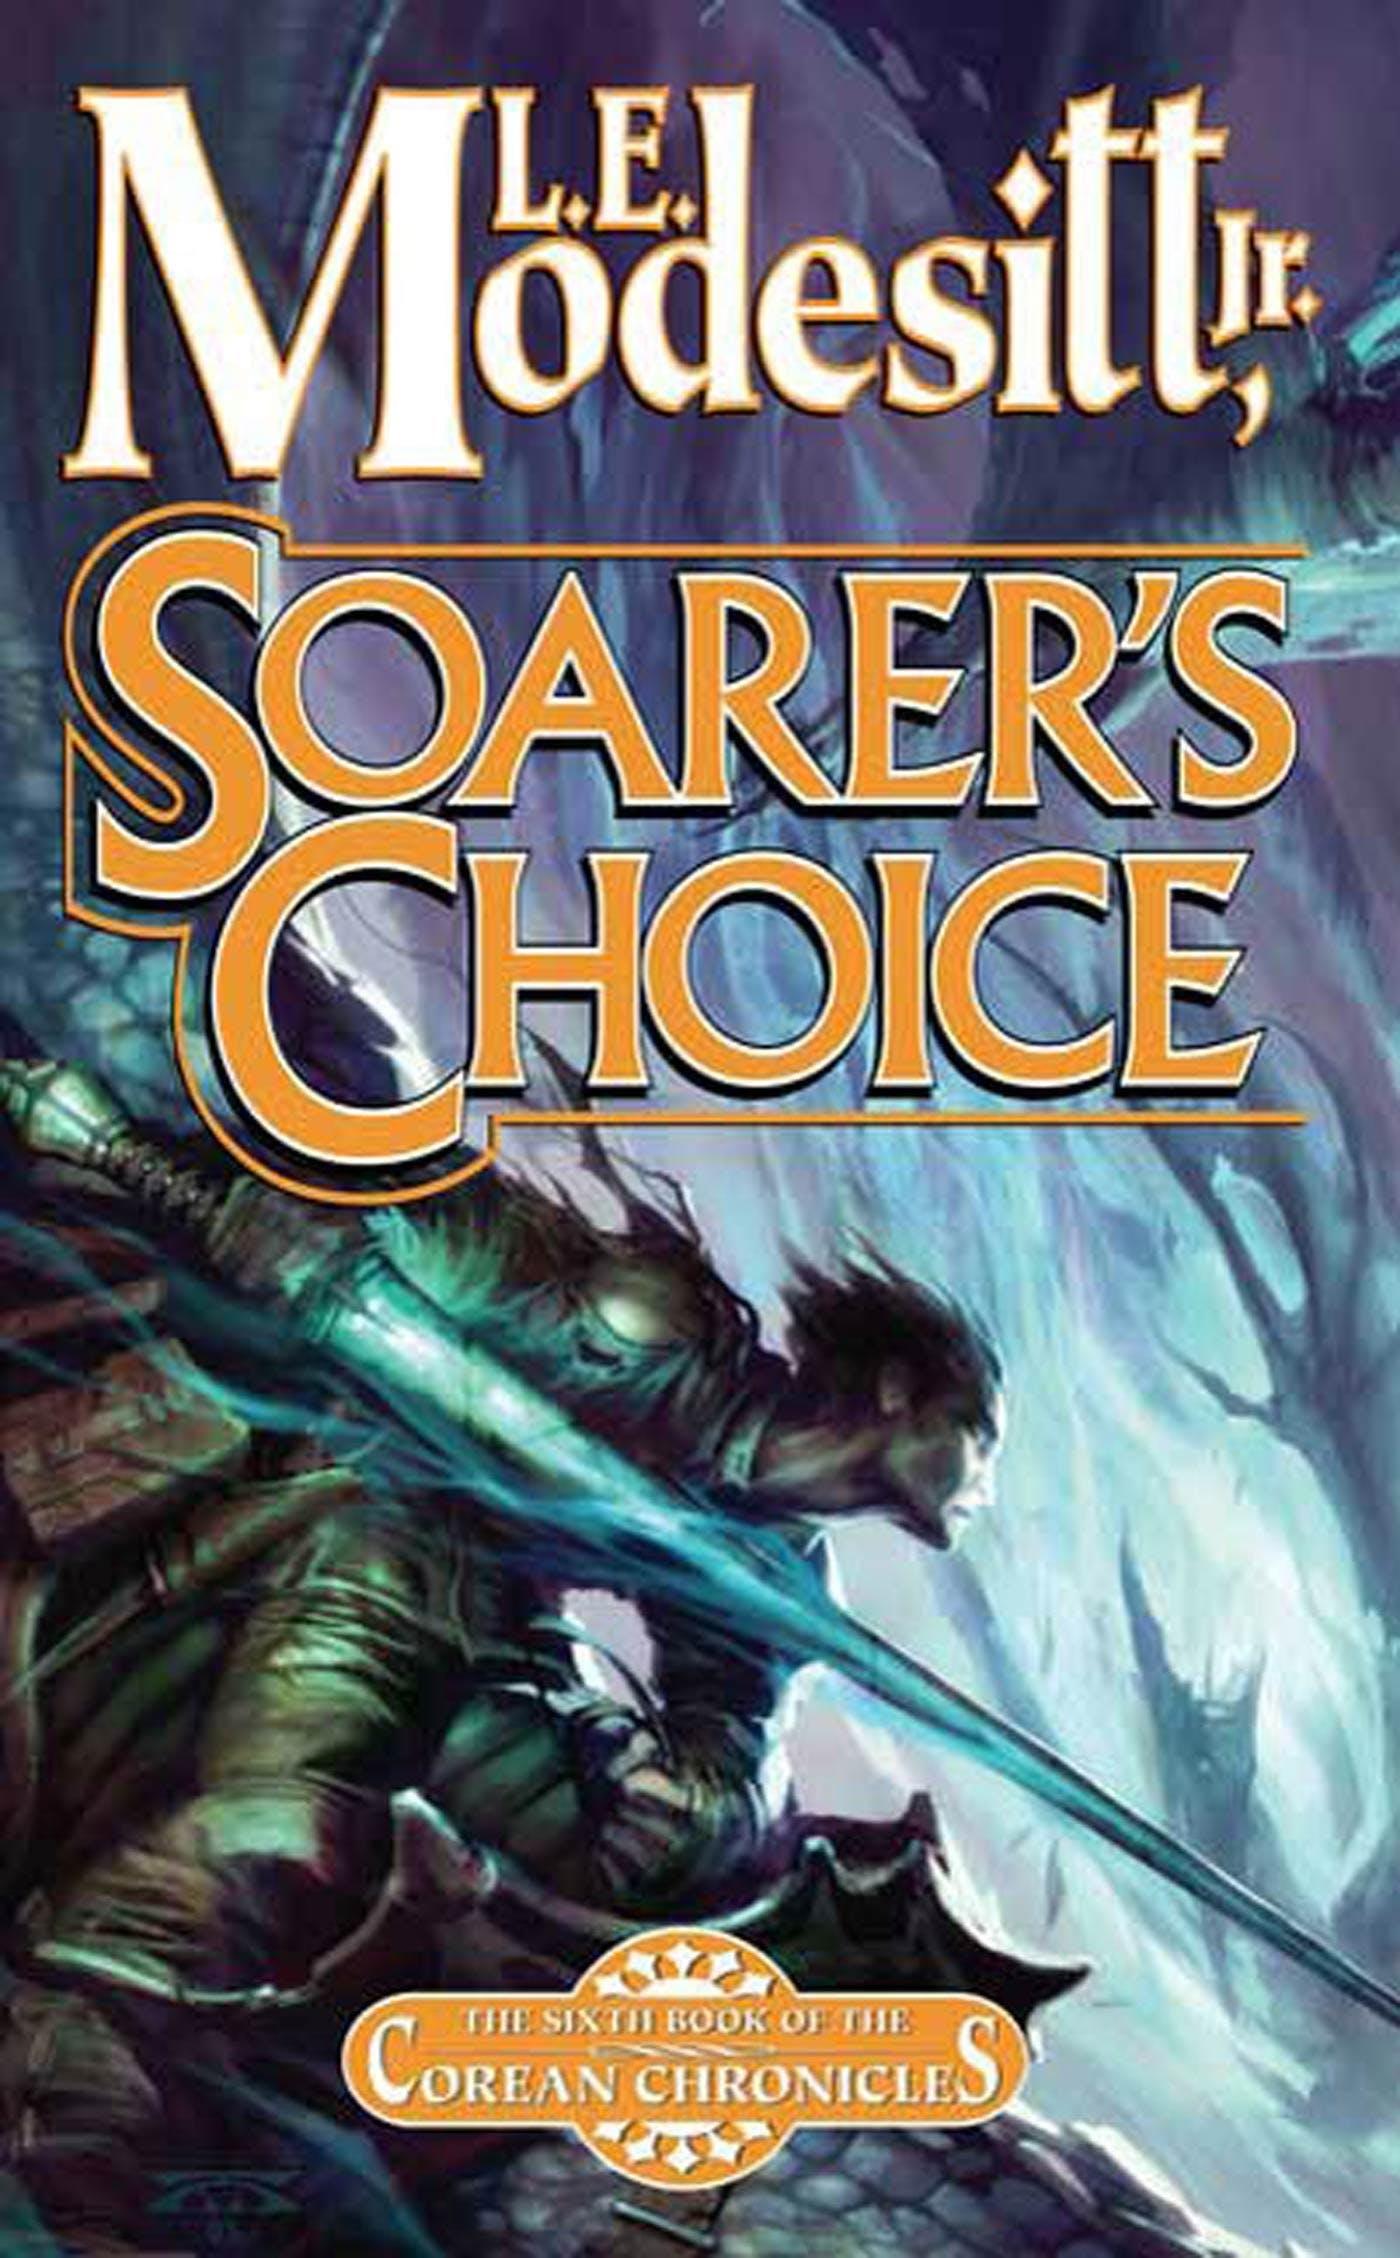 Image of Soarer's Choice